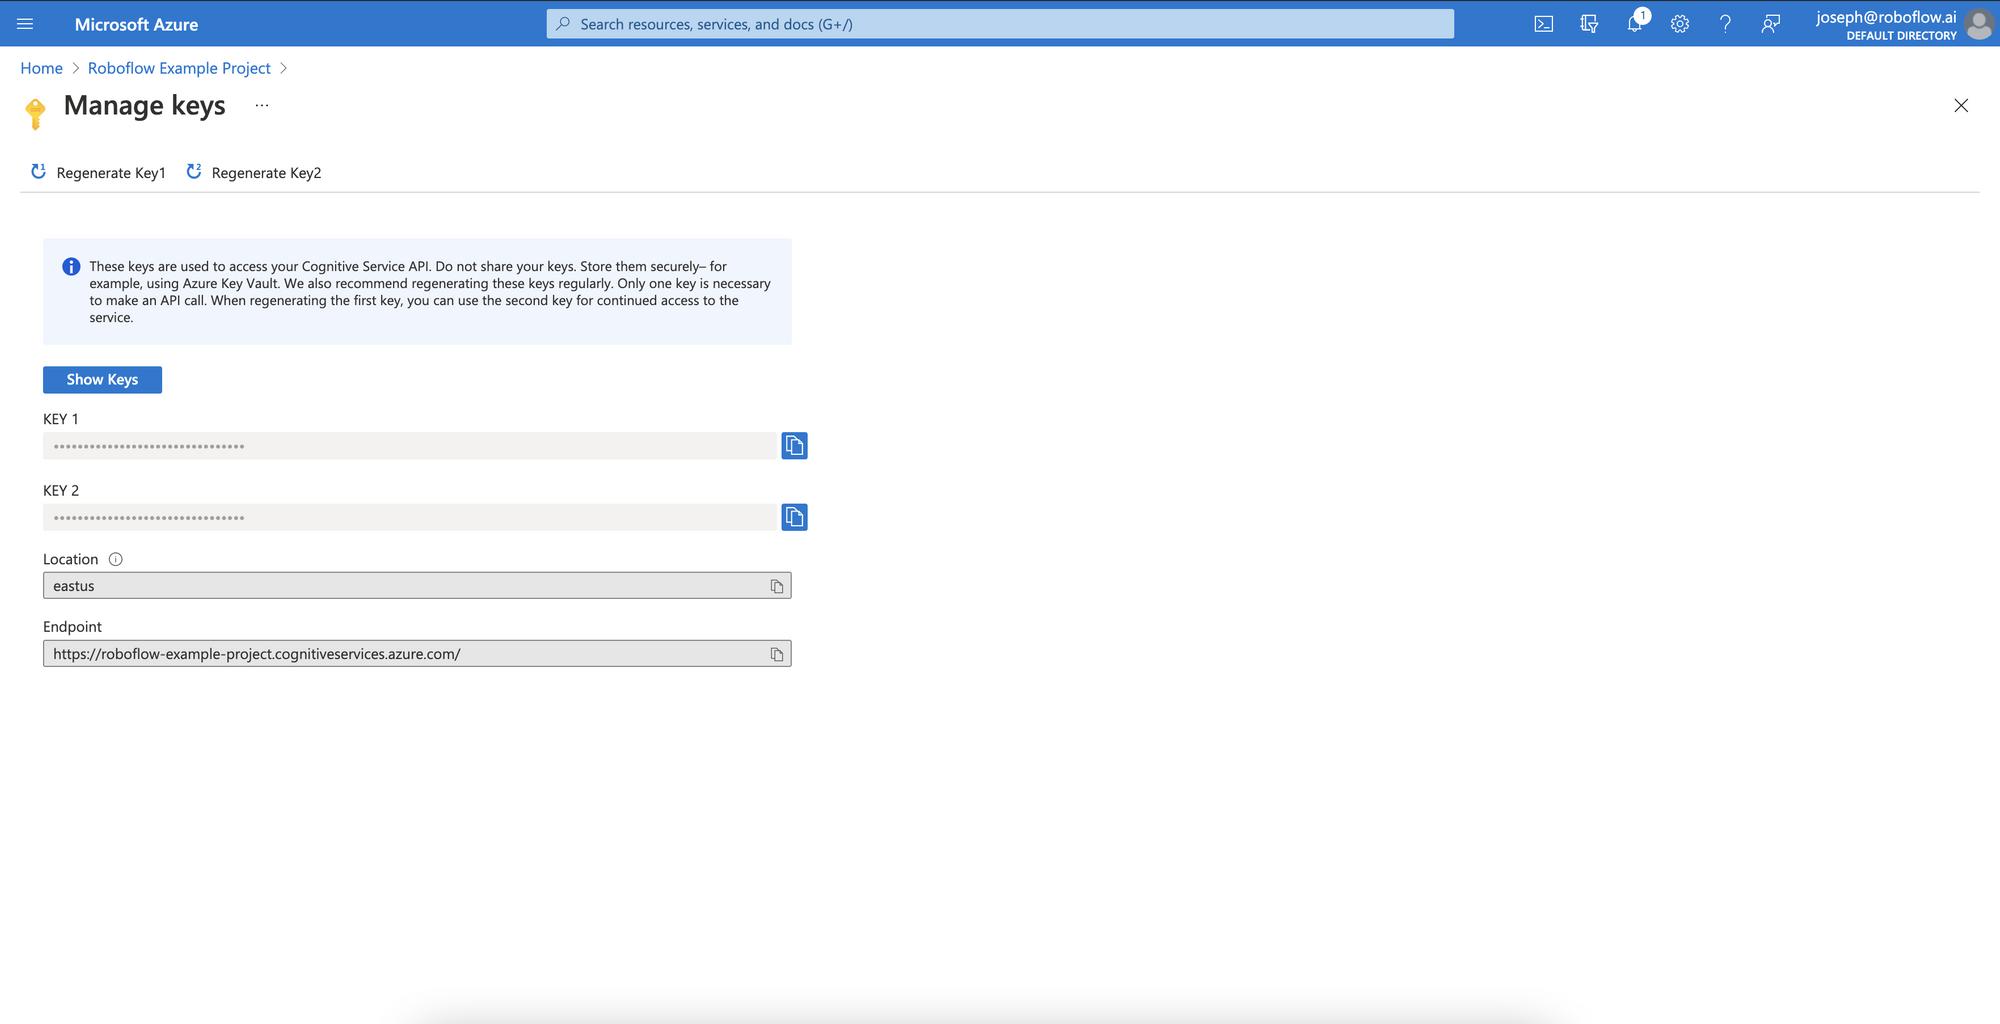 The API Keys for a Microsoft Azure project.